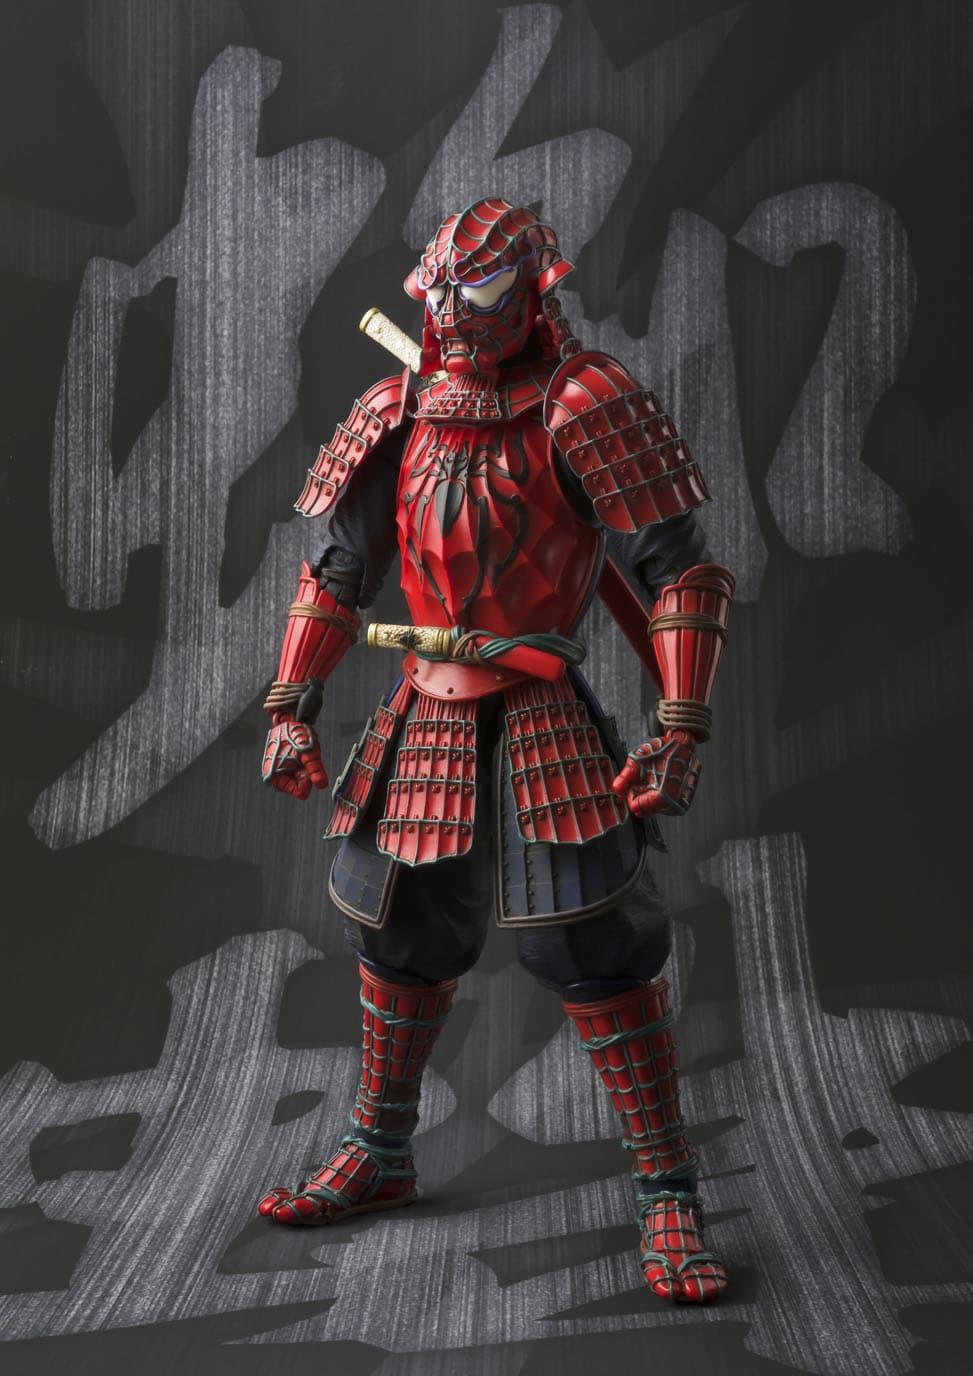 SAMURAI SPIDER-MAN FIGURA 18 CM MARVEL MEISHO MANGA REALIZATION